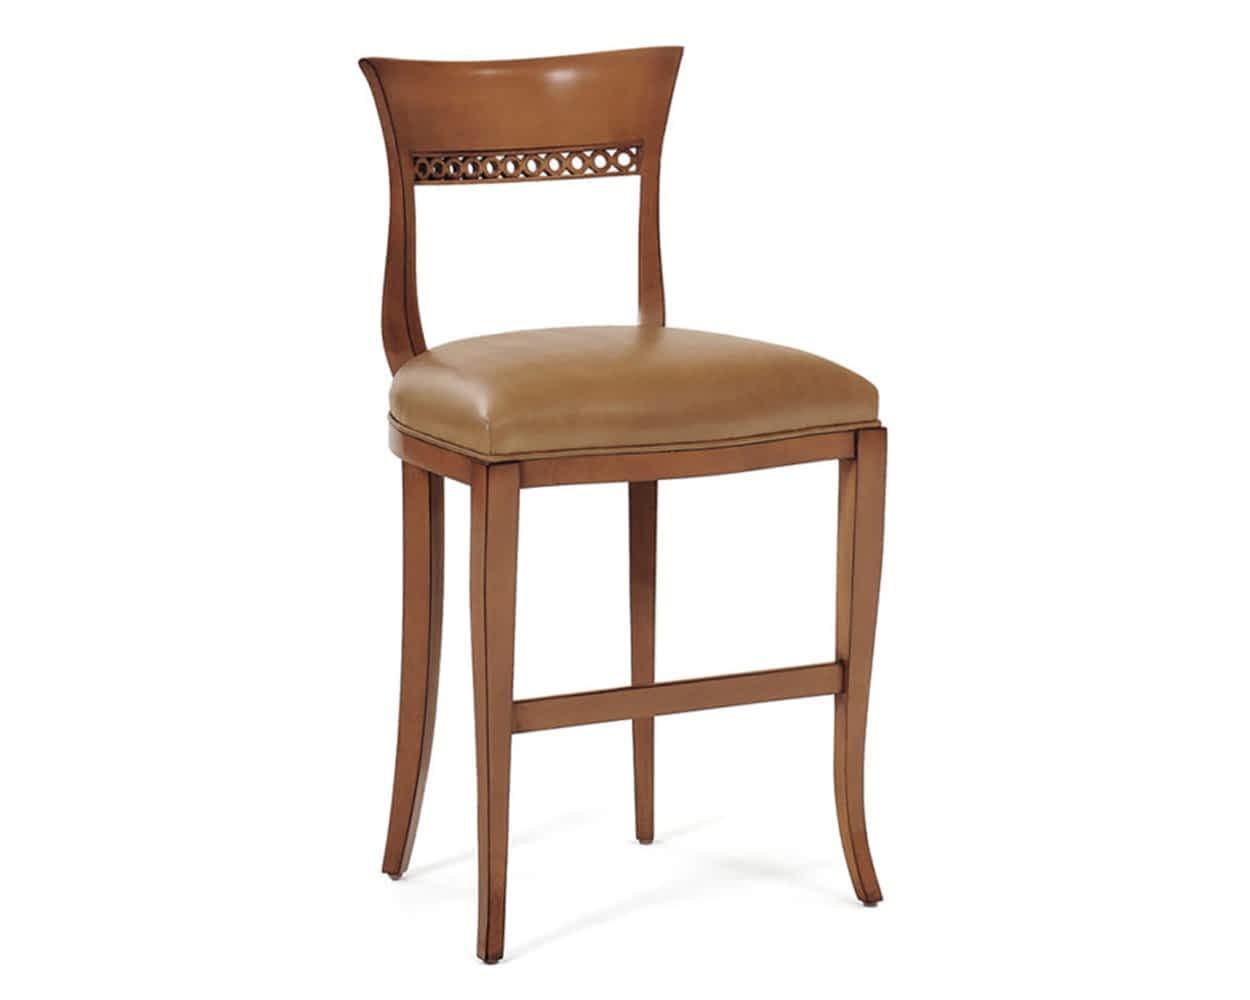 8009-Plaza-Arm-Bar-Chair-610×771-900×900